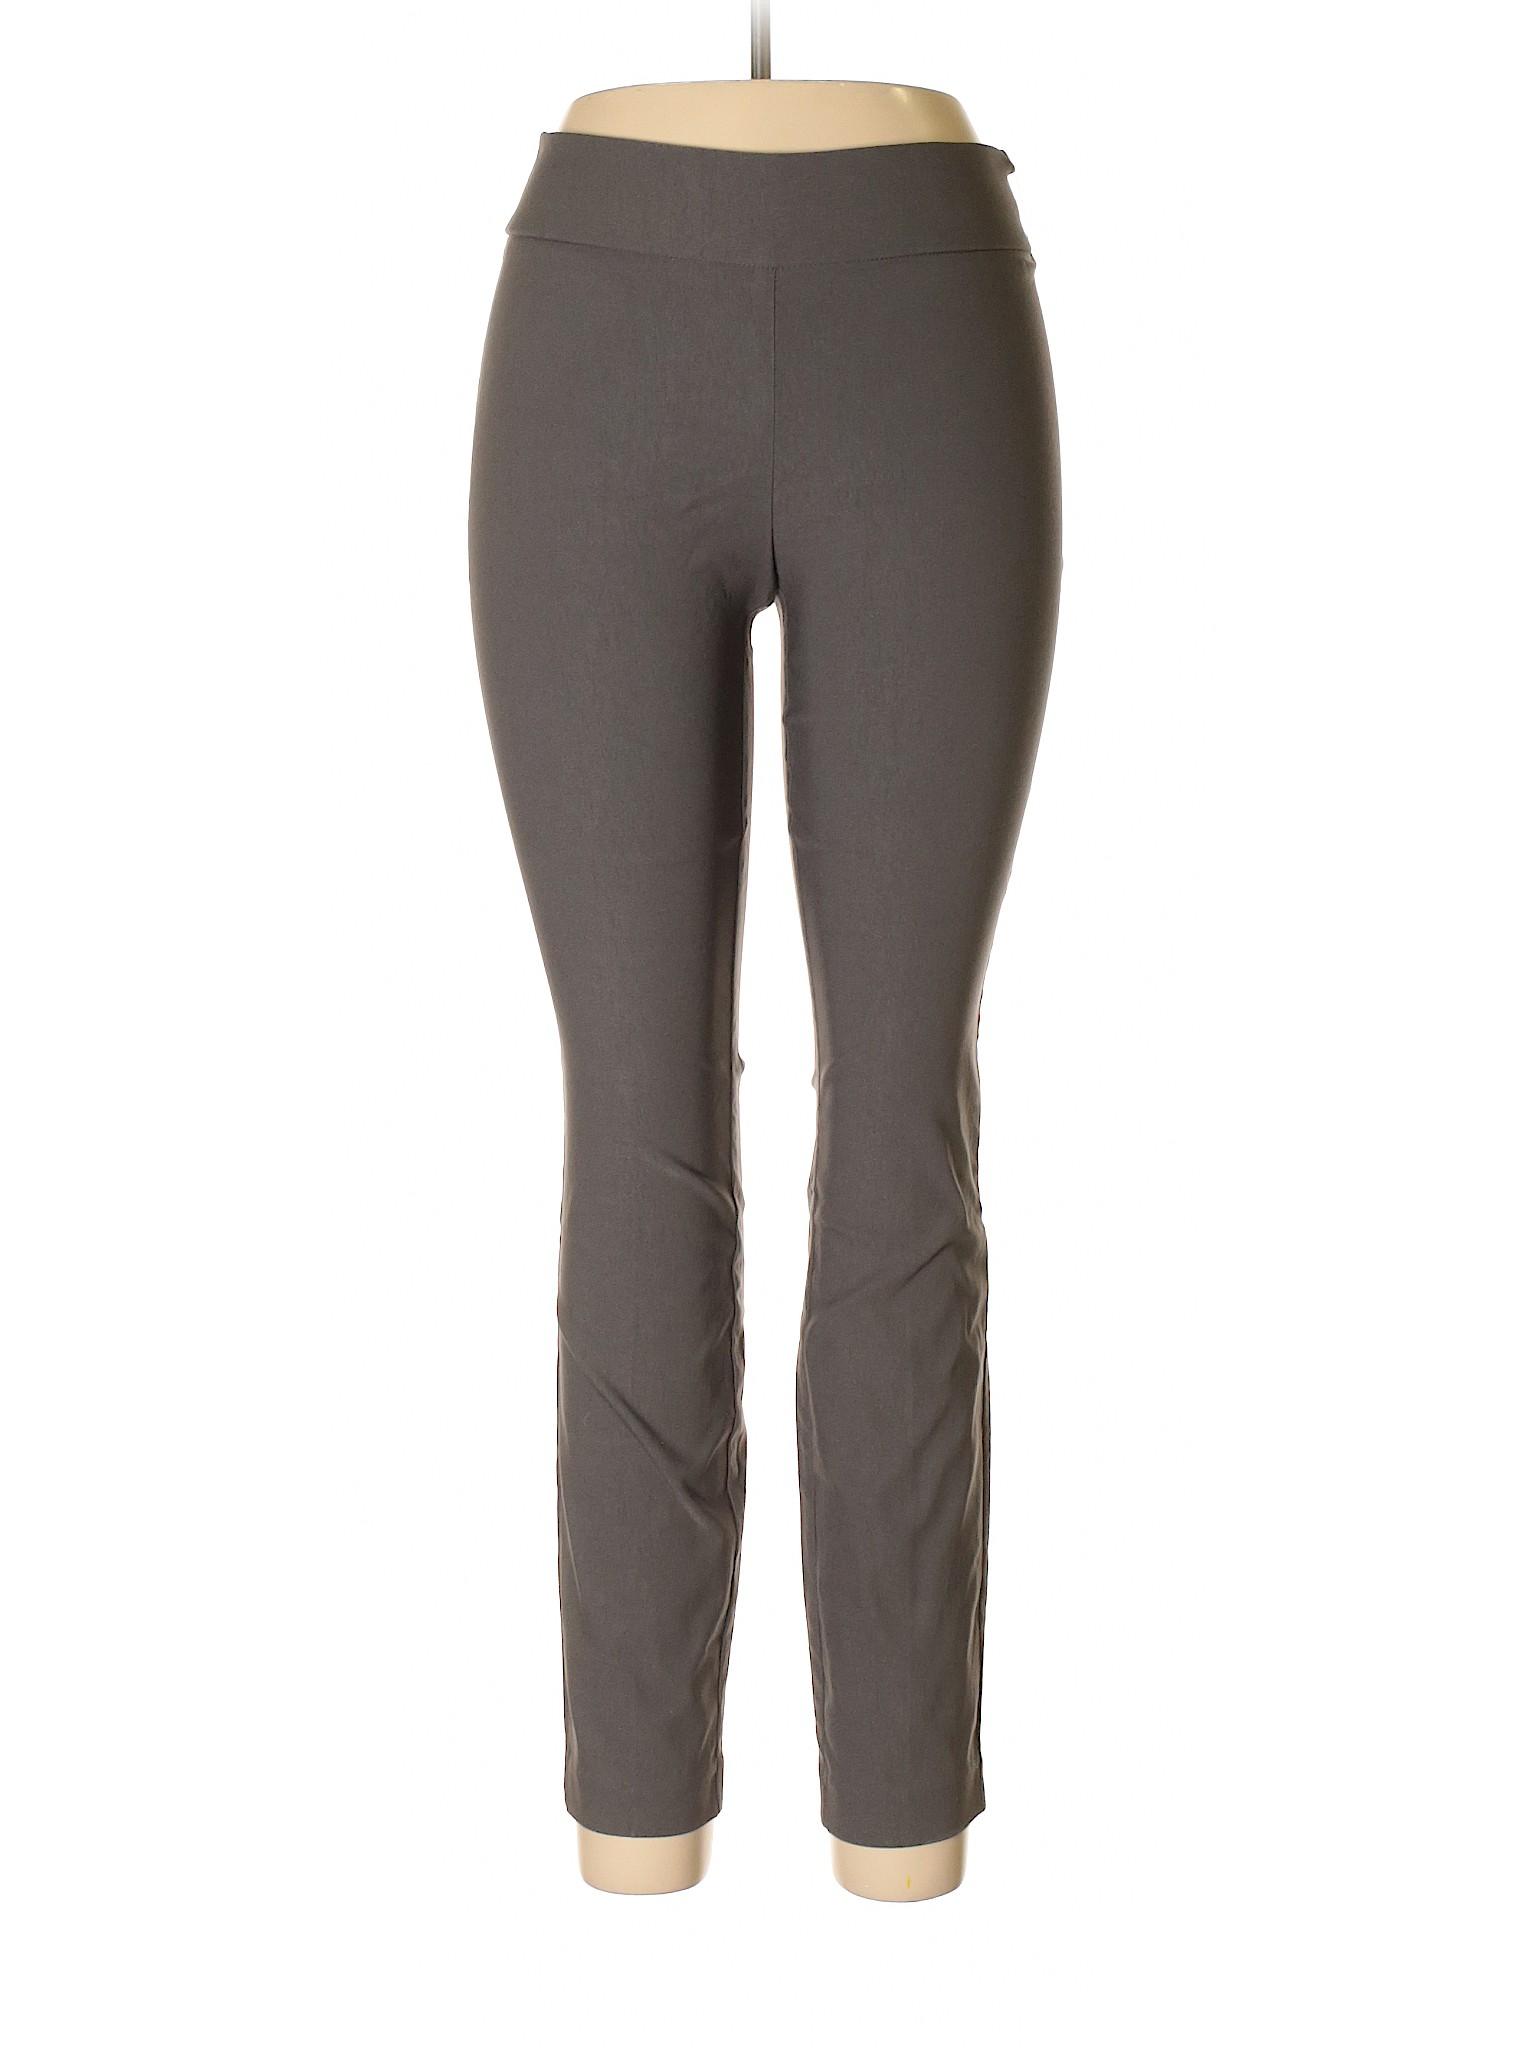 9 Apt winter Casual Boutique Pants WZcaU16nH